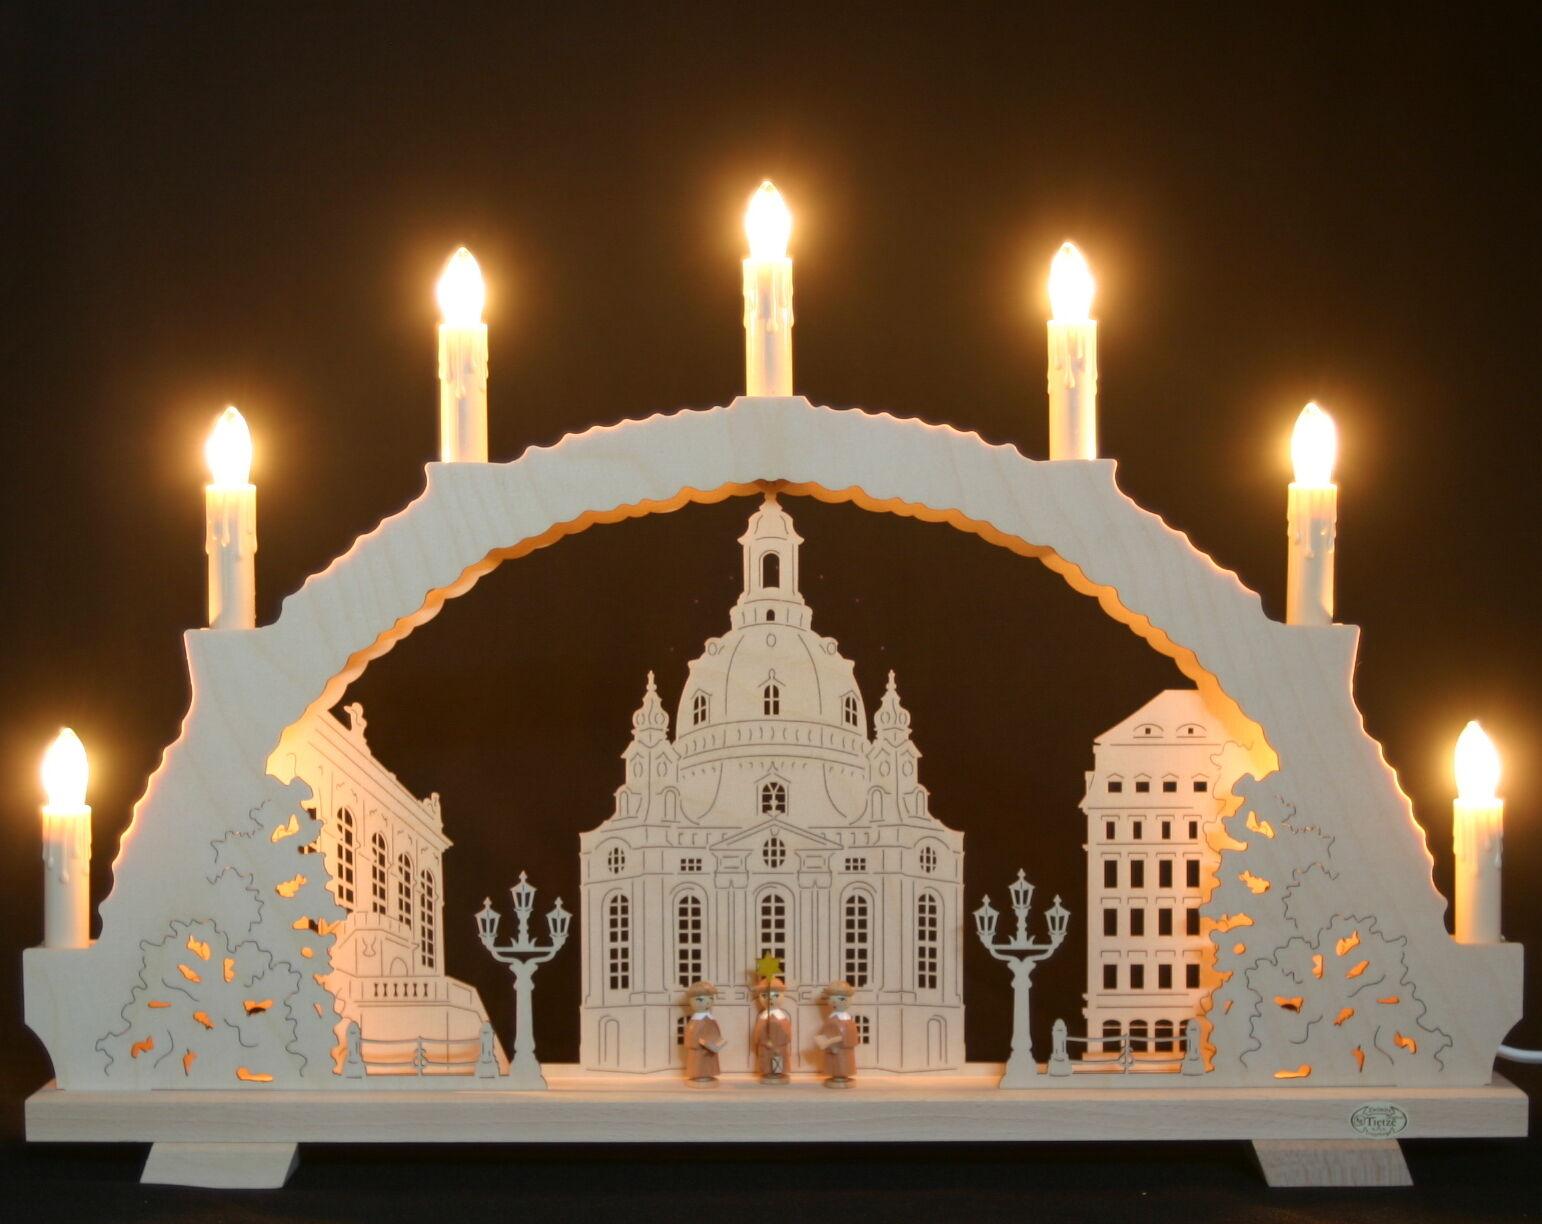 3d-Schwibbogen 7 velas mujeres iglesia Dresden 53cm Erzgebirge luces arco nuevo